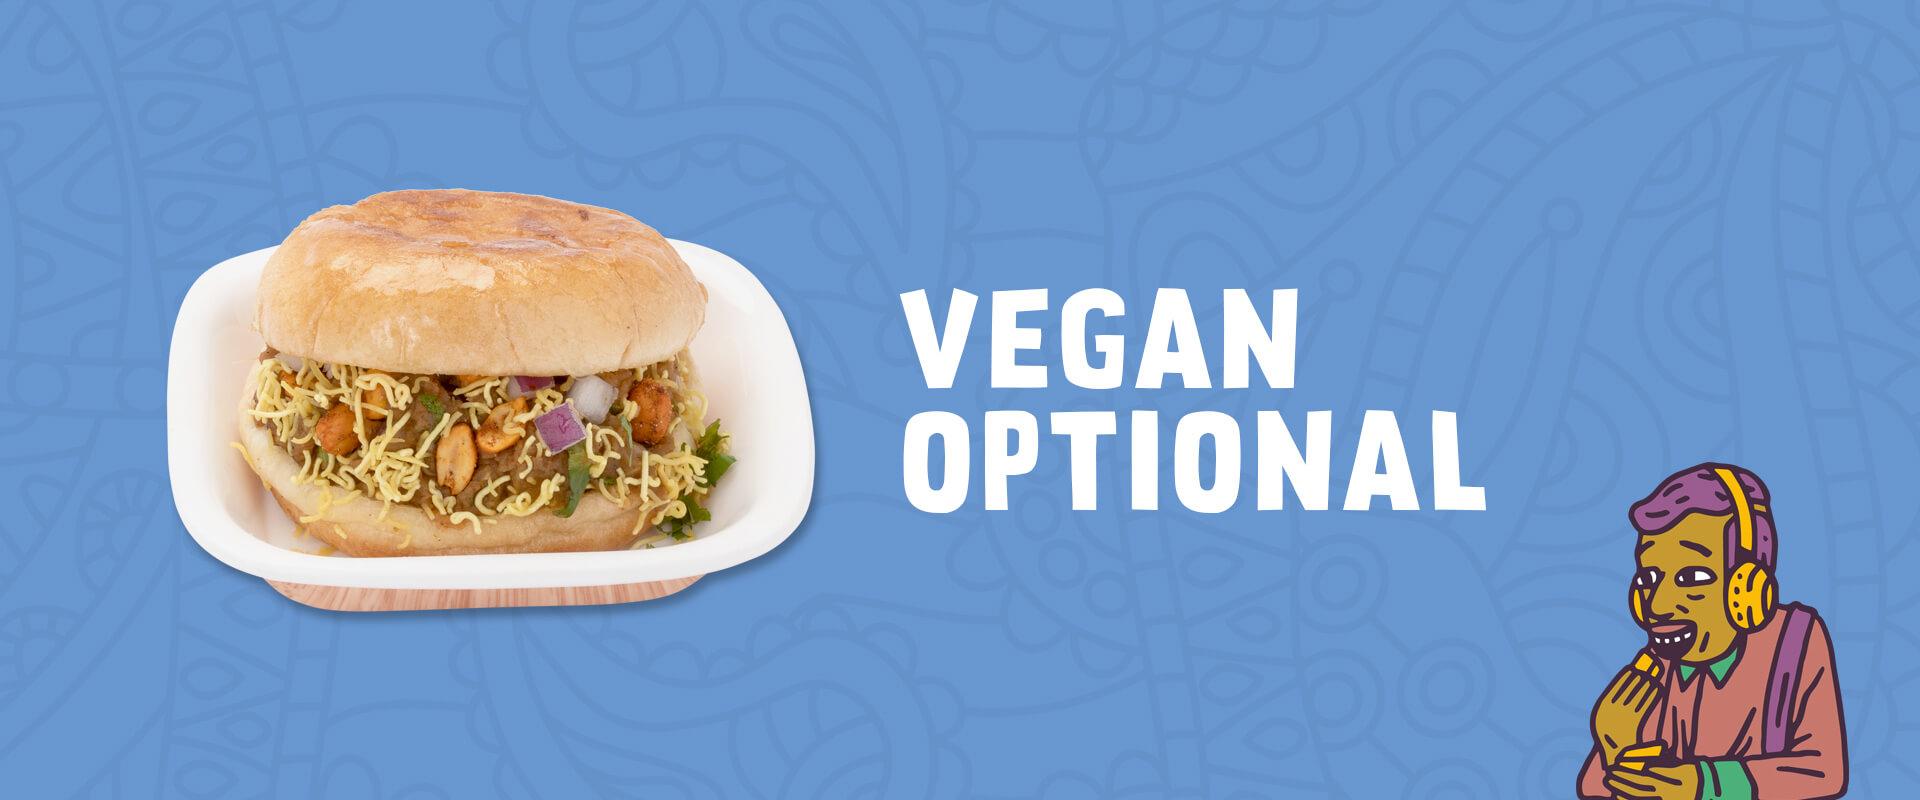 vegan optional food available ar Neehee's